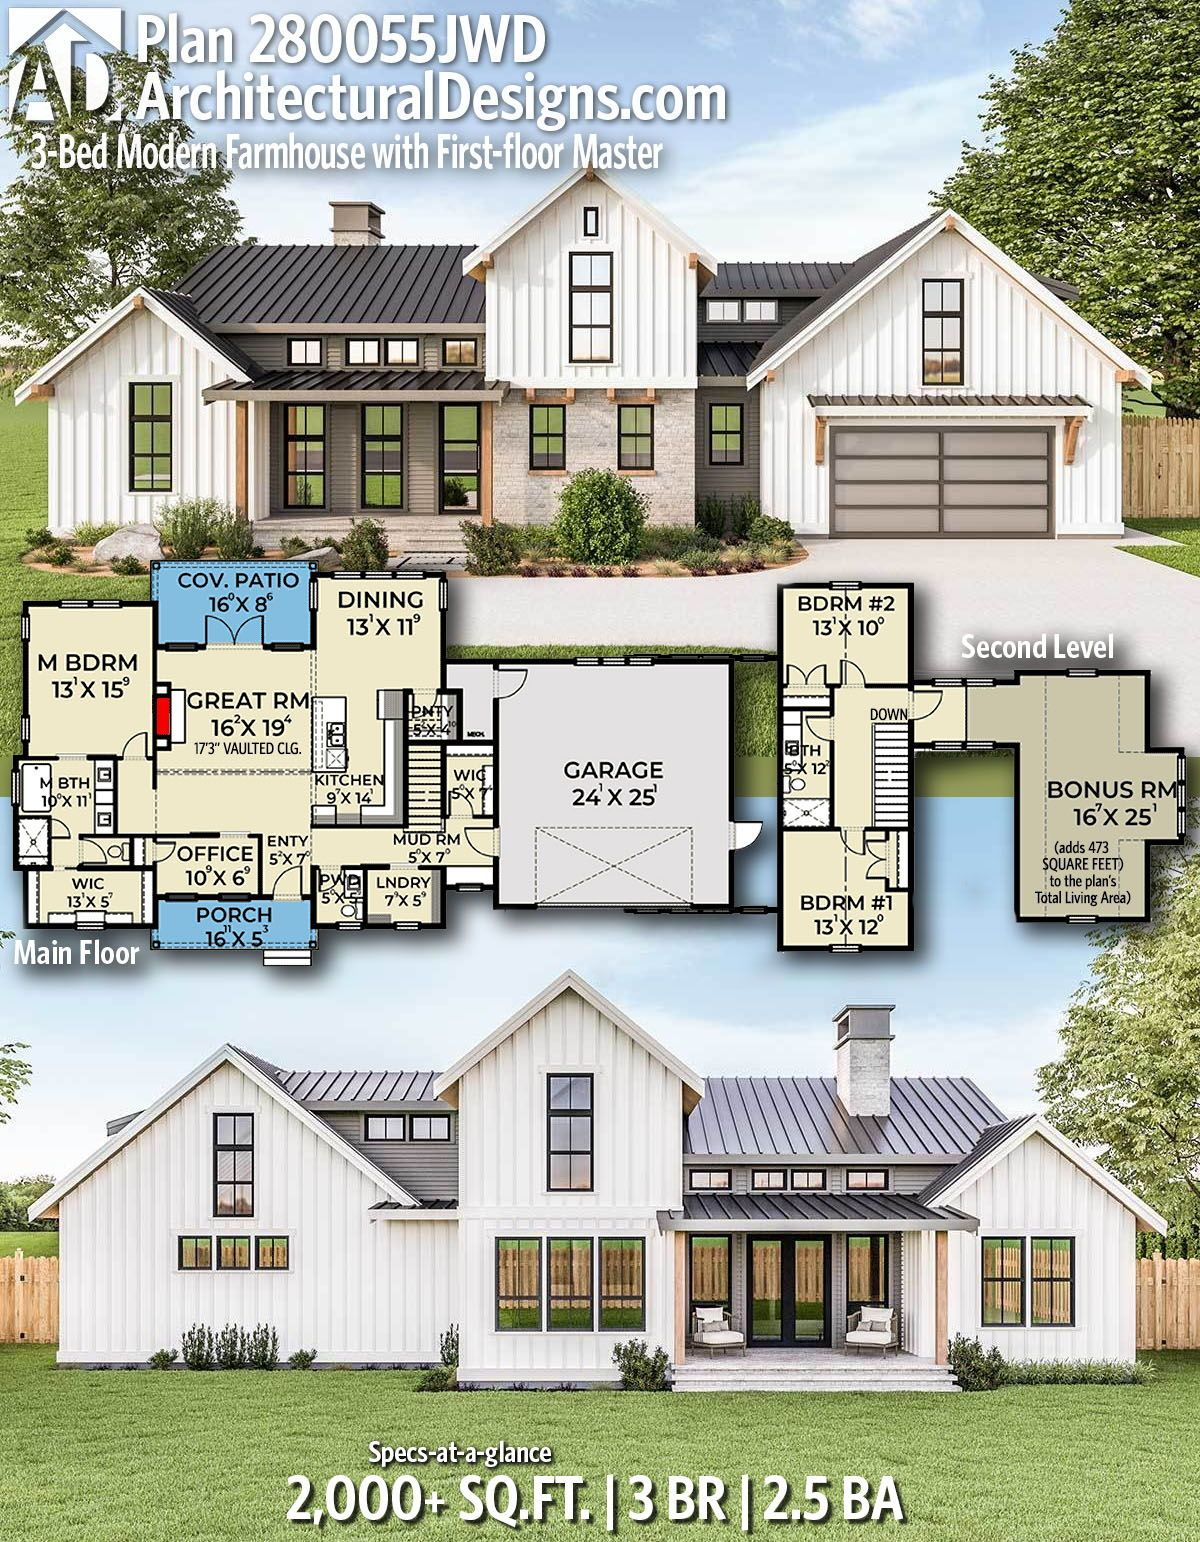 Plan 280055JWD 3Bed Modern Farmhouse with Firstfloor